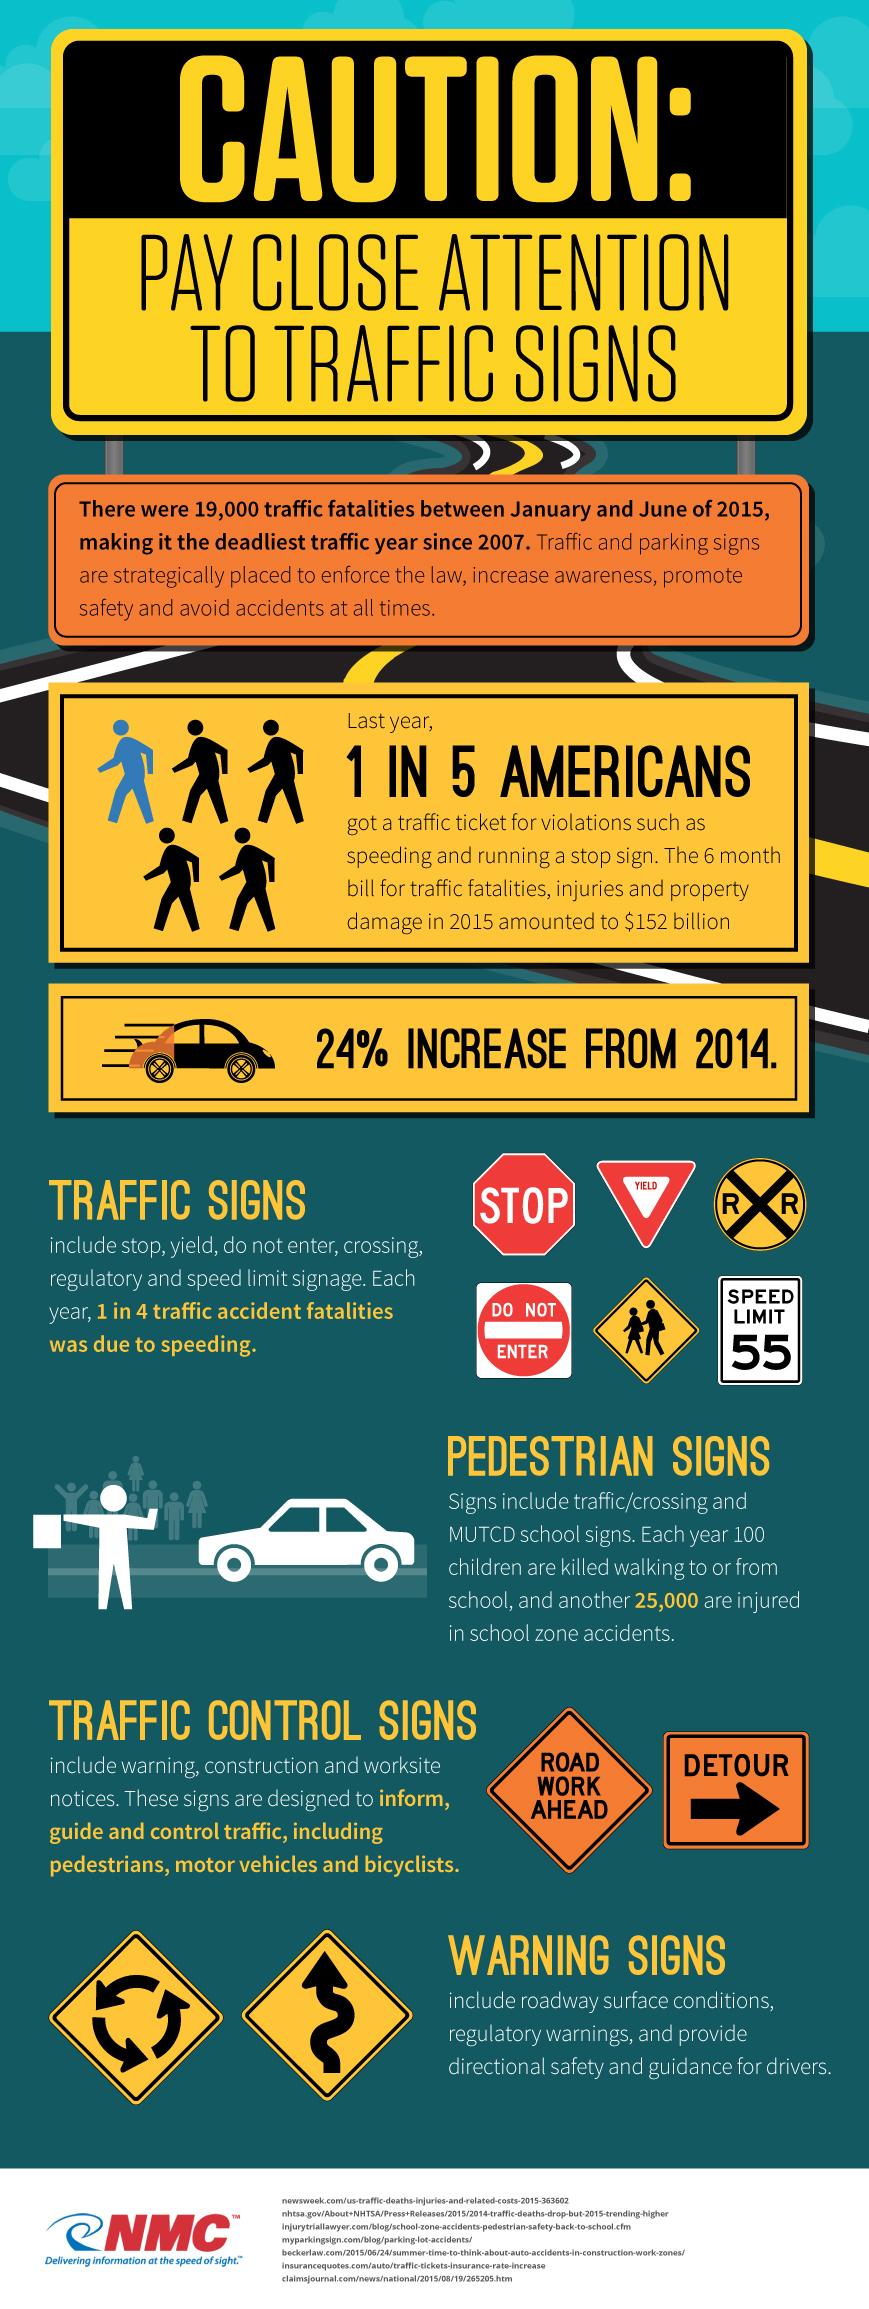 Traffic signs matter.